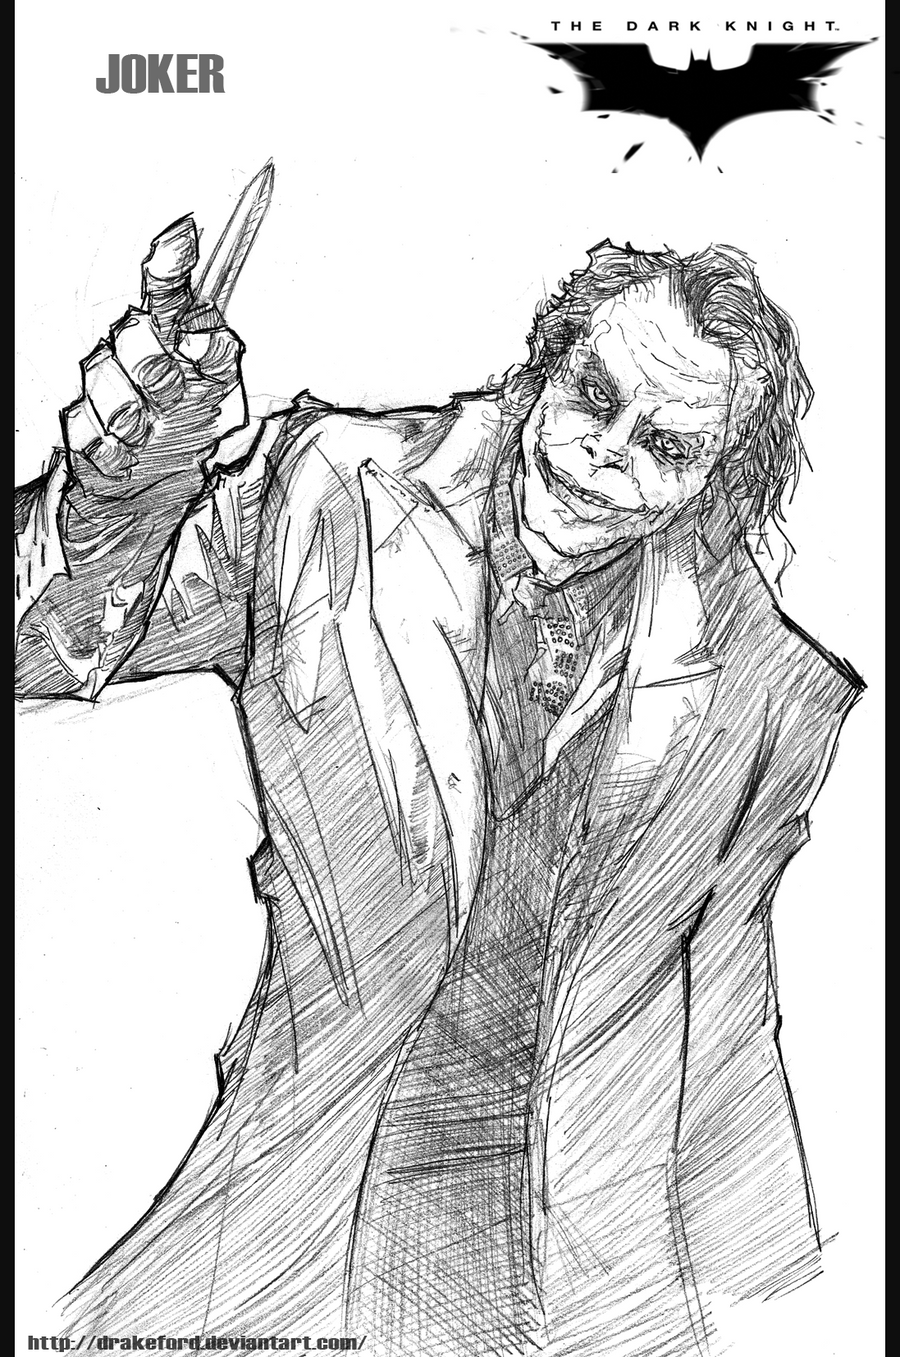 Free coloring pages joker - Free Coloring Pages Joker Free Coloring Pages Joker The Dark Knight Coloring Pages Free Dark